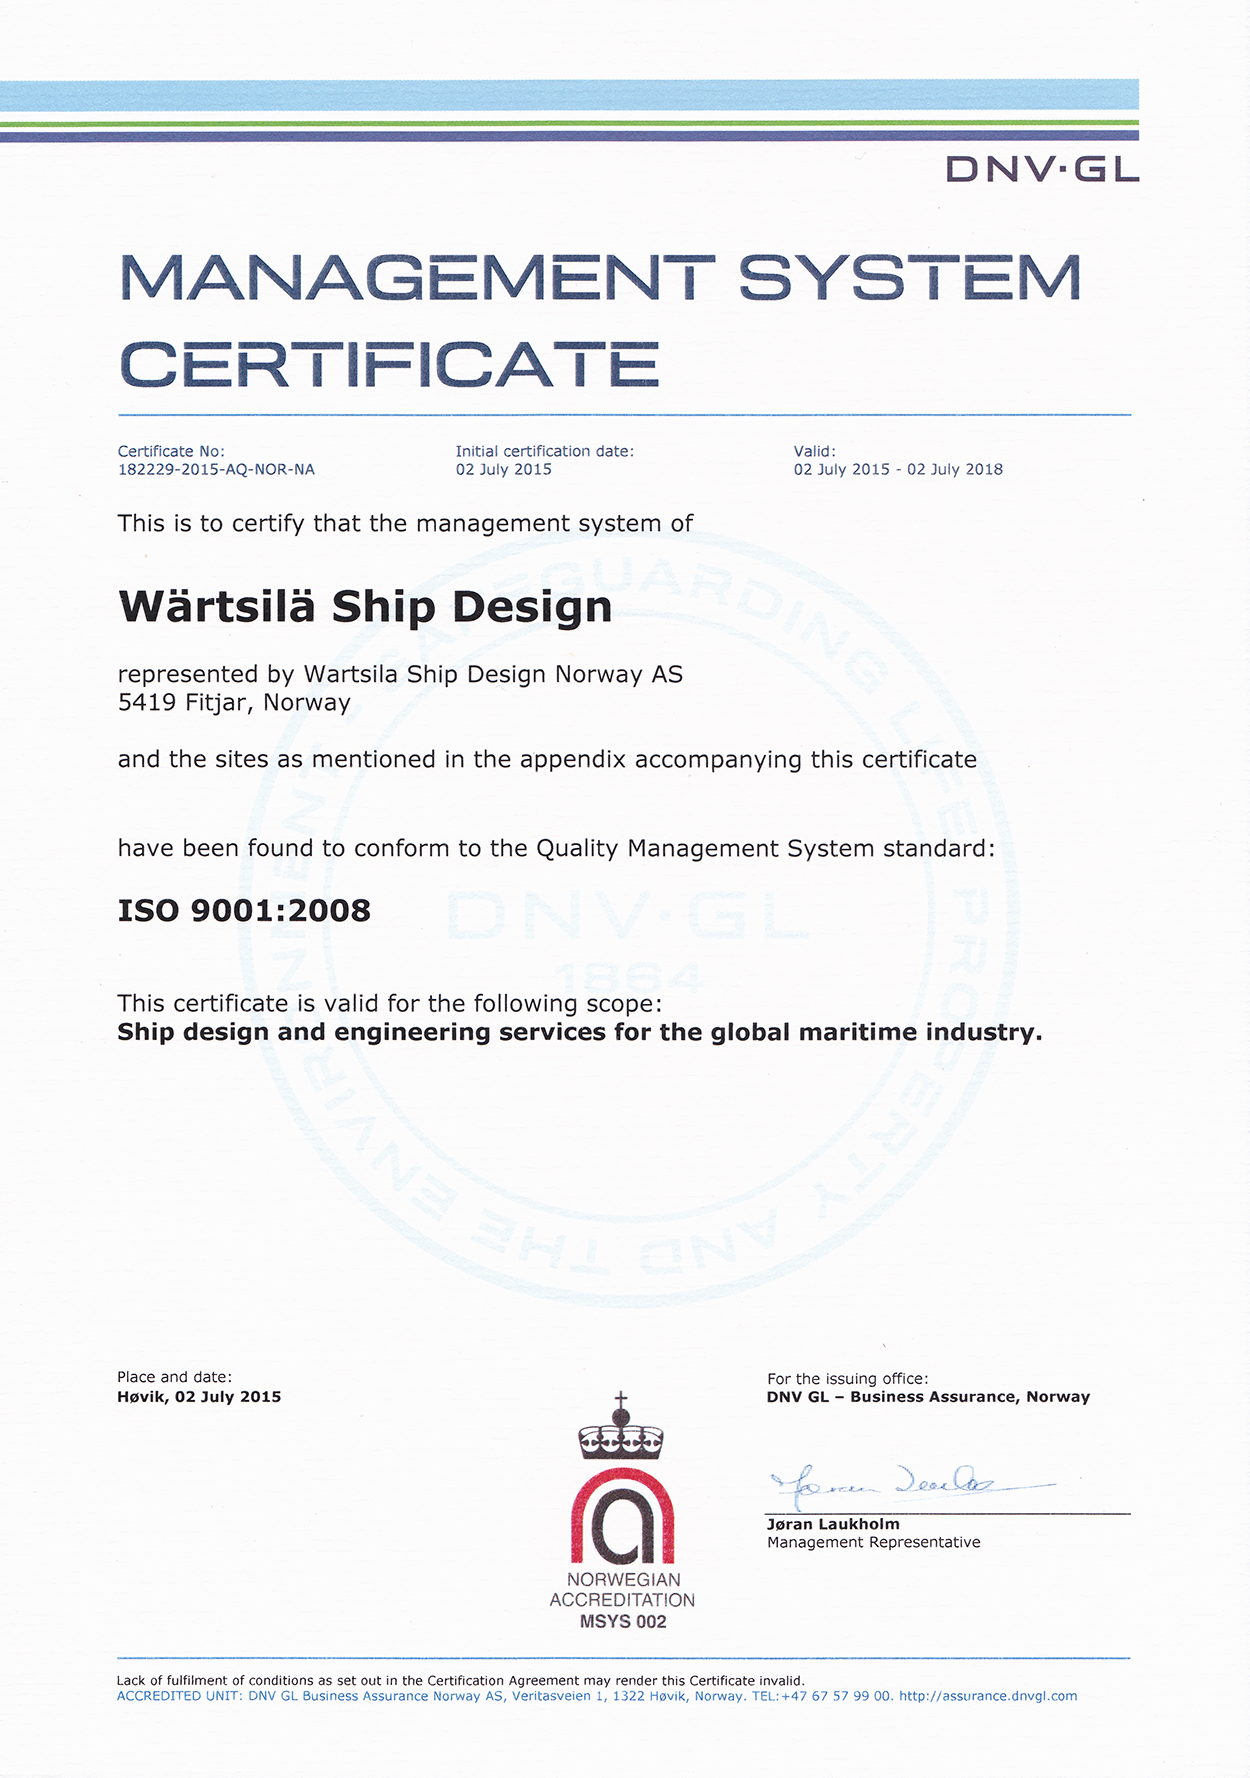 WSD ISO 9001 Certificate